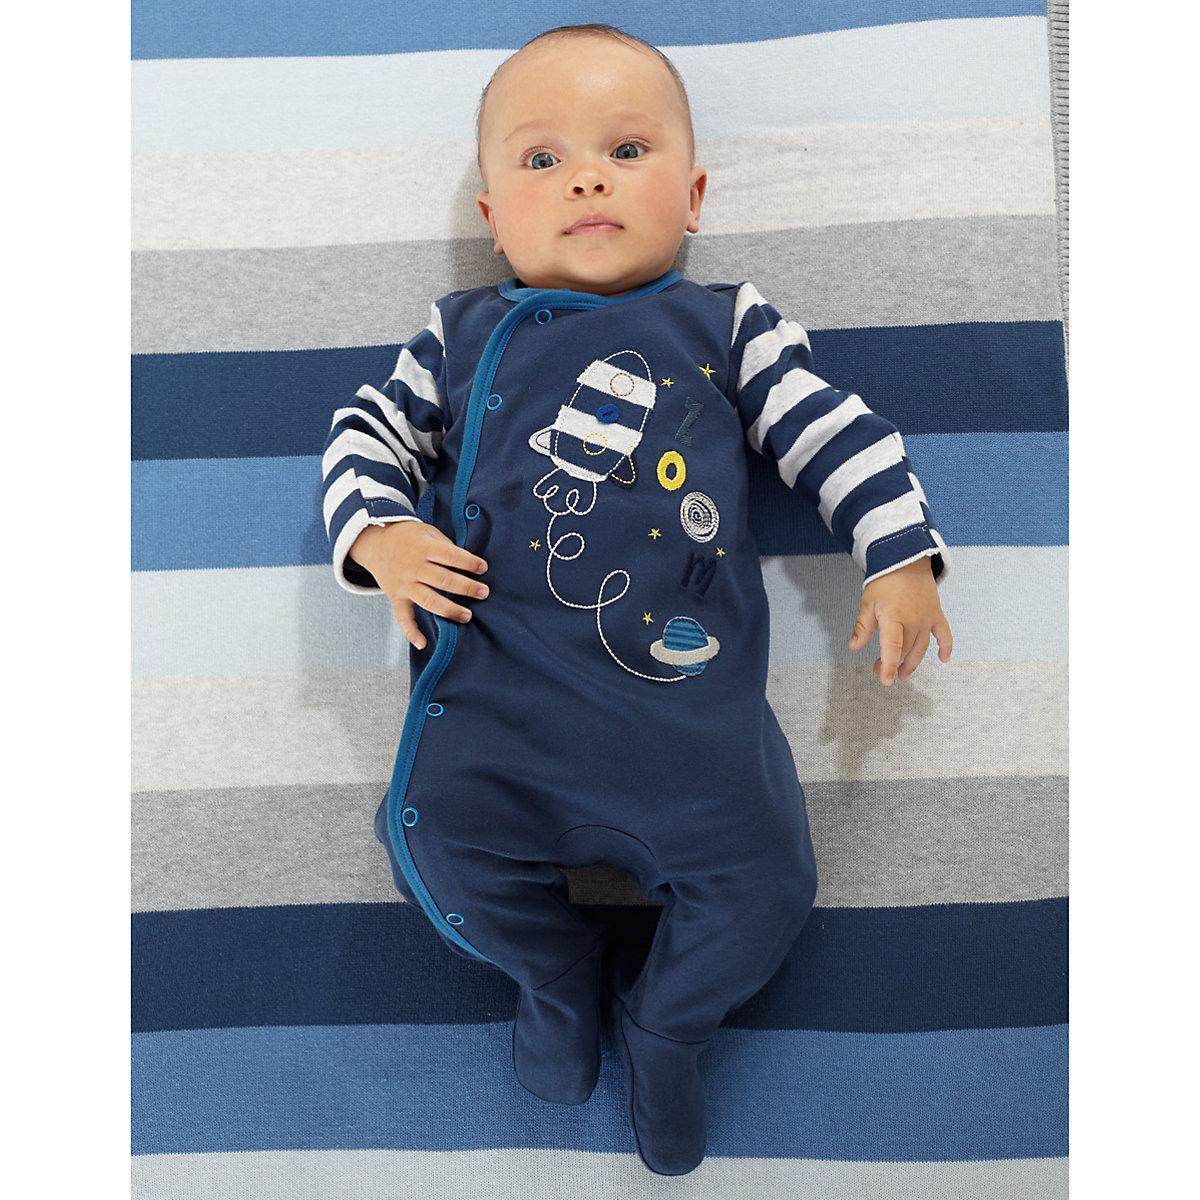 Mothercare Newborns Space Adventure Sleepsuits - 3 Pack